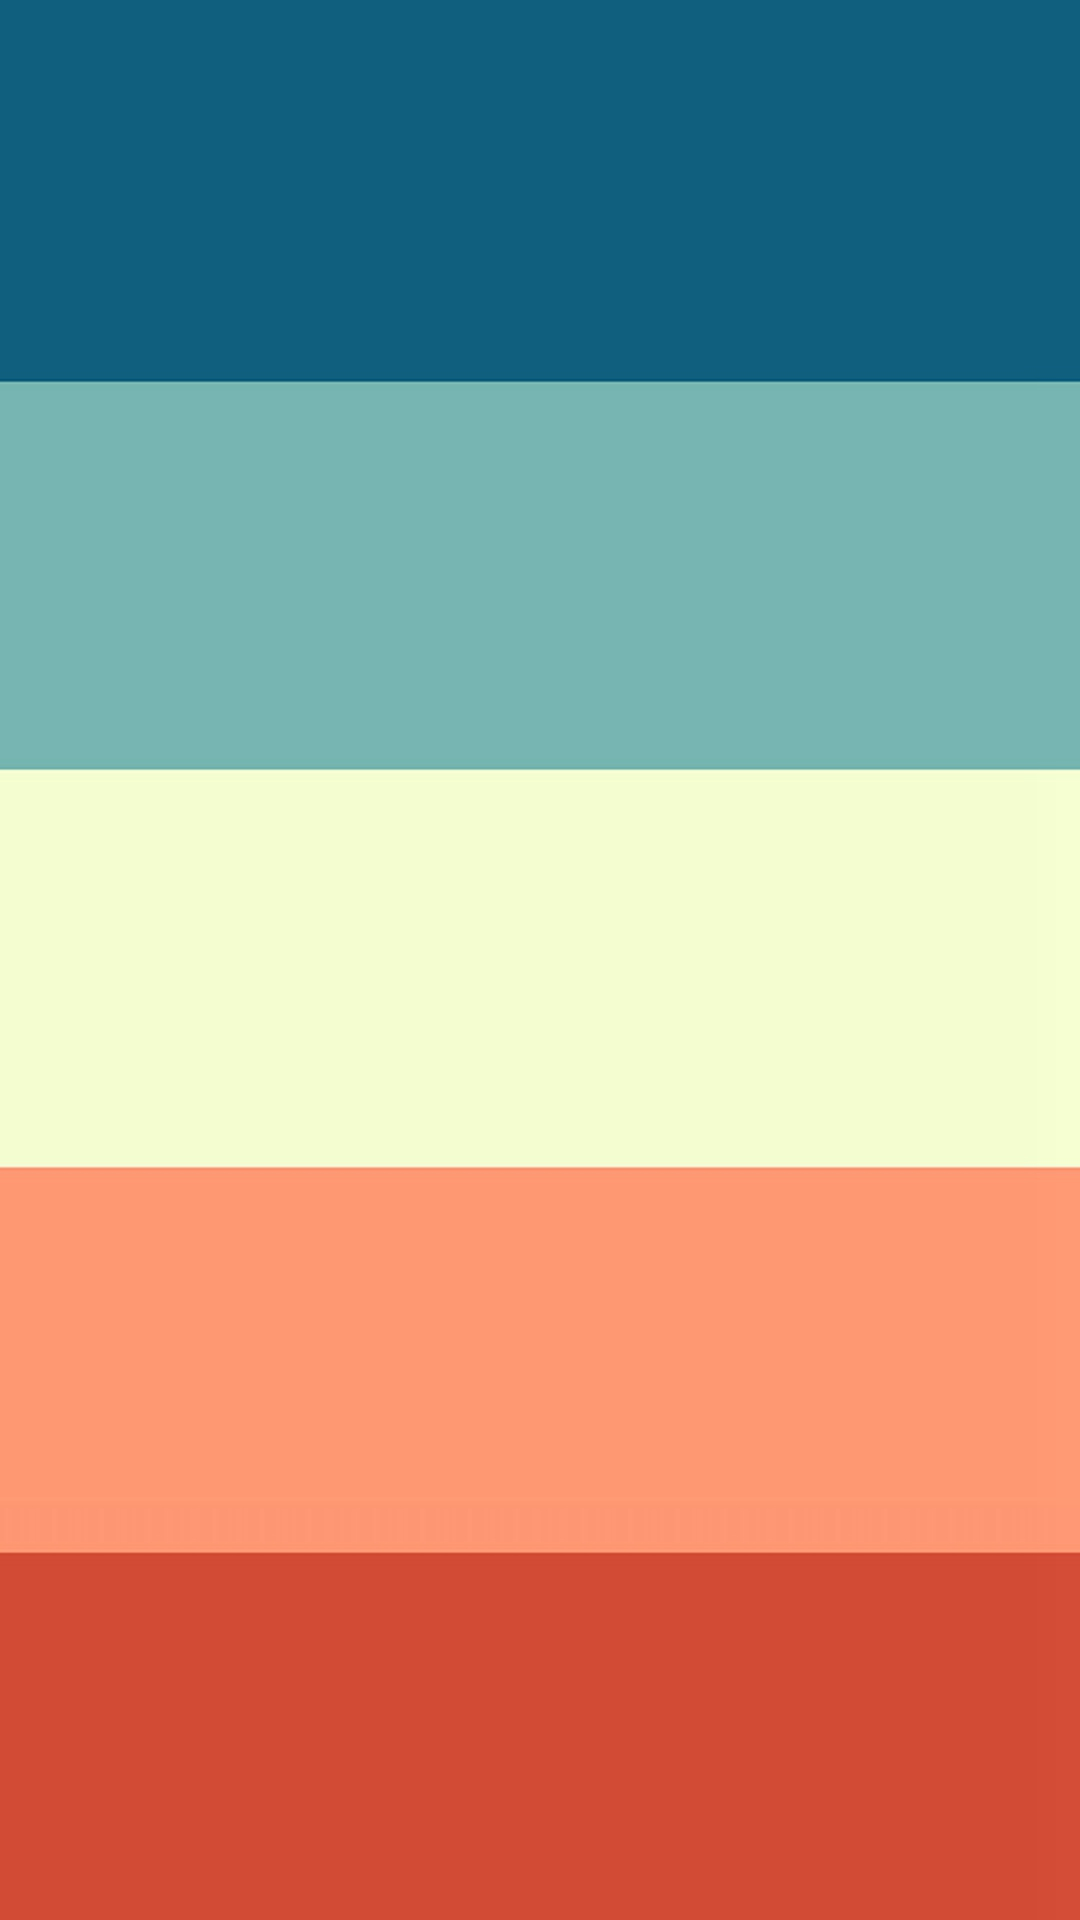 Colorlovers-Red-Blue-Orange-Gradation-Blur-iPhone-plus-wallpaper-wp5804676